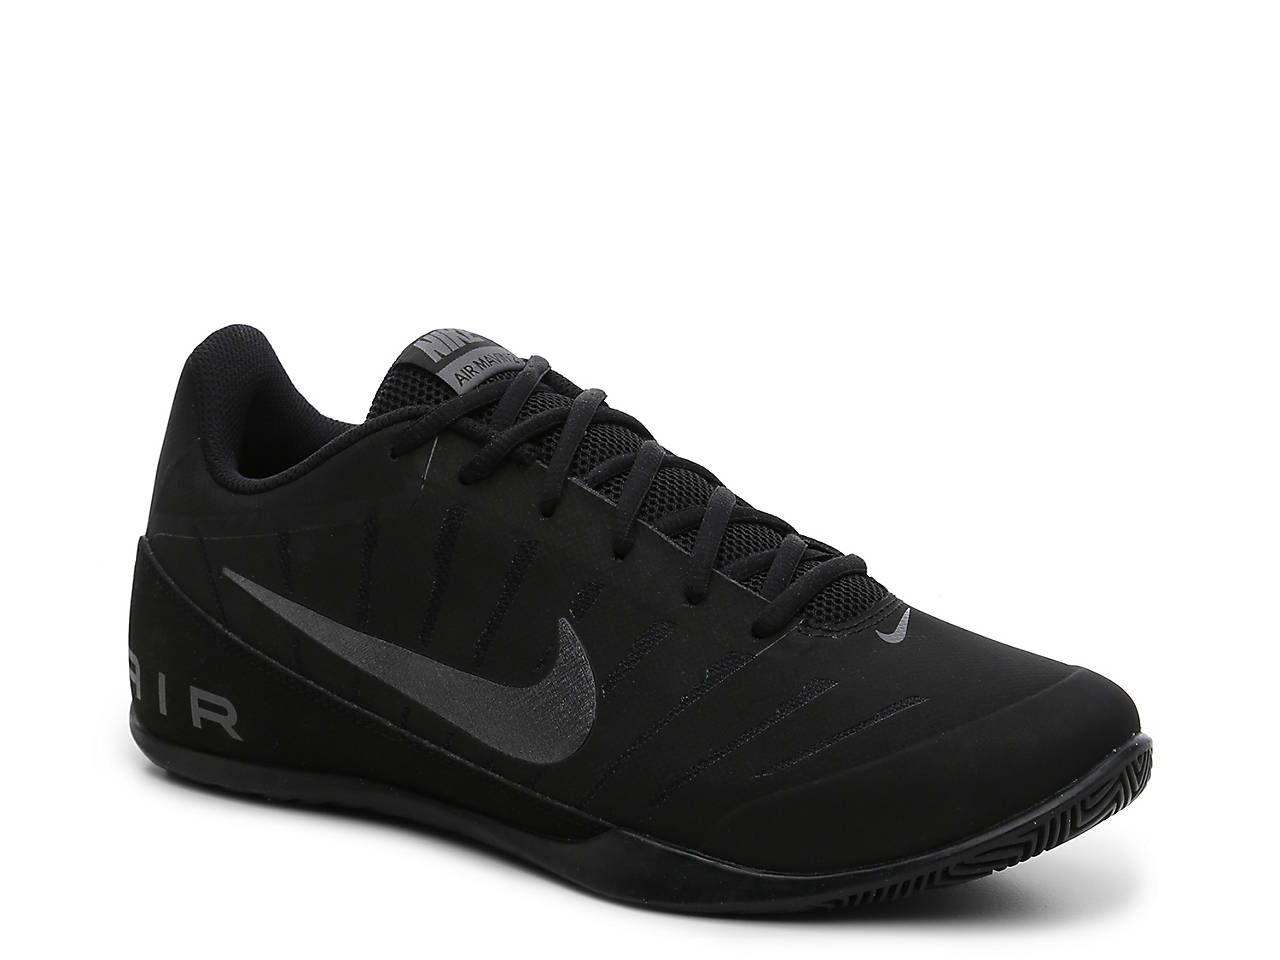 Nike Air Mavin 2 Basketball Shoe - Men s Men s Shoes  275a77319ce6